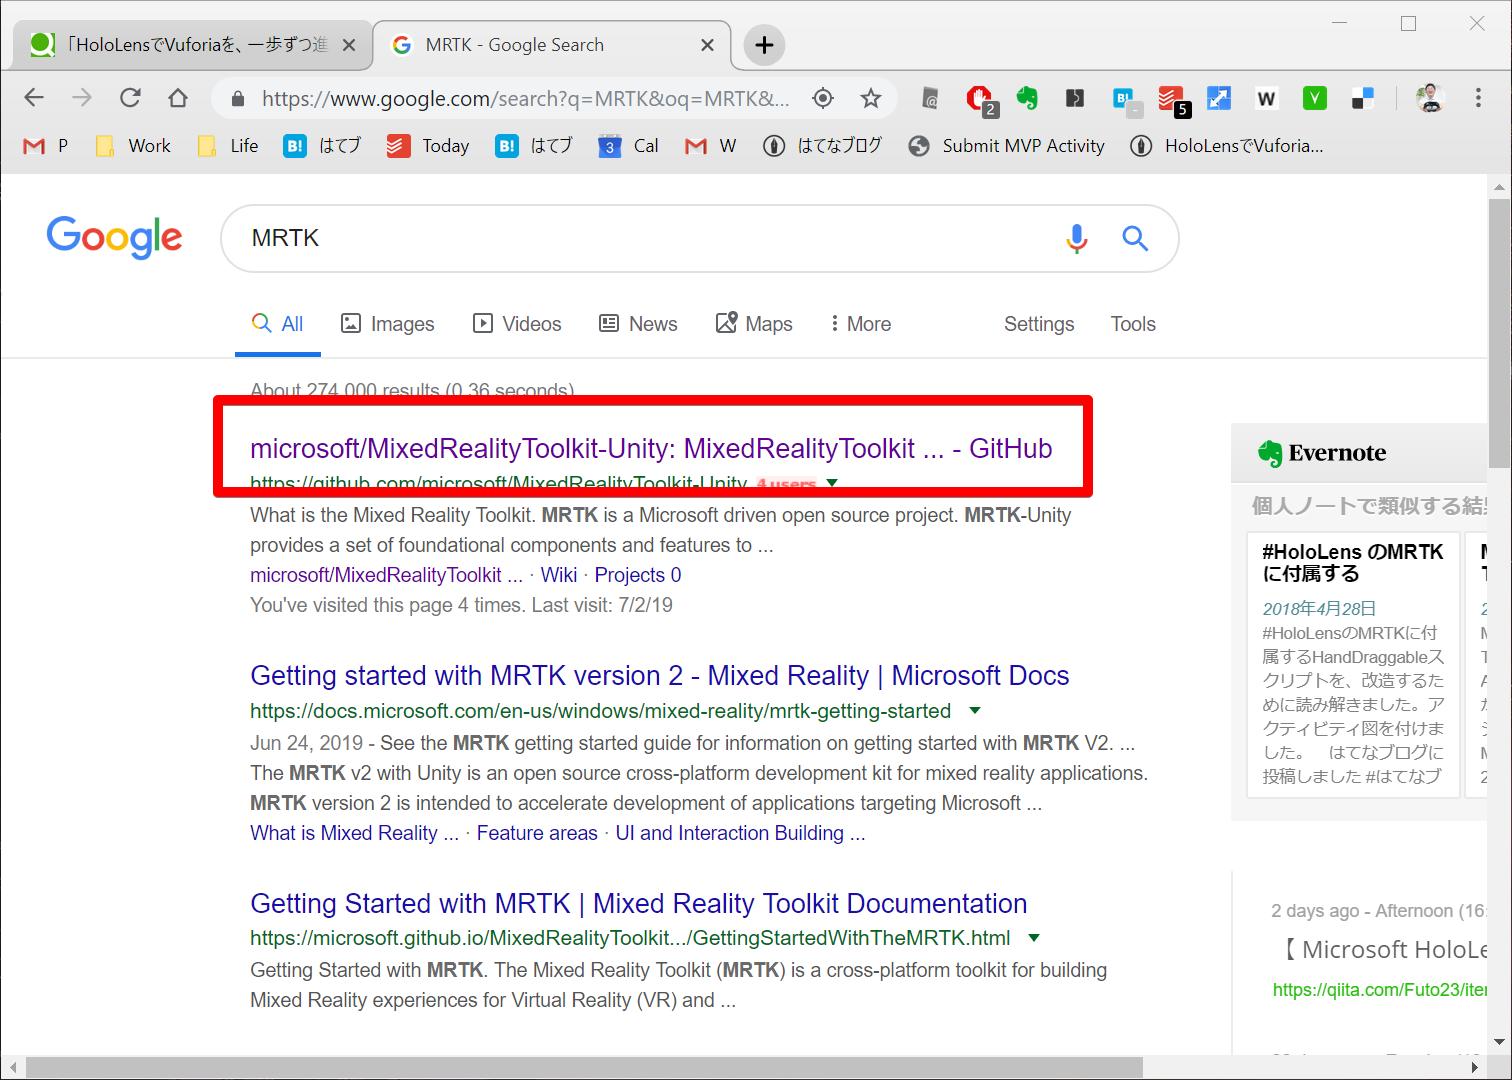 MRTK - Google Search - Google Chrome 2019-07-05 08.03.18.png